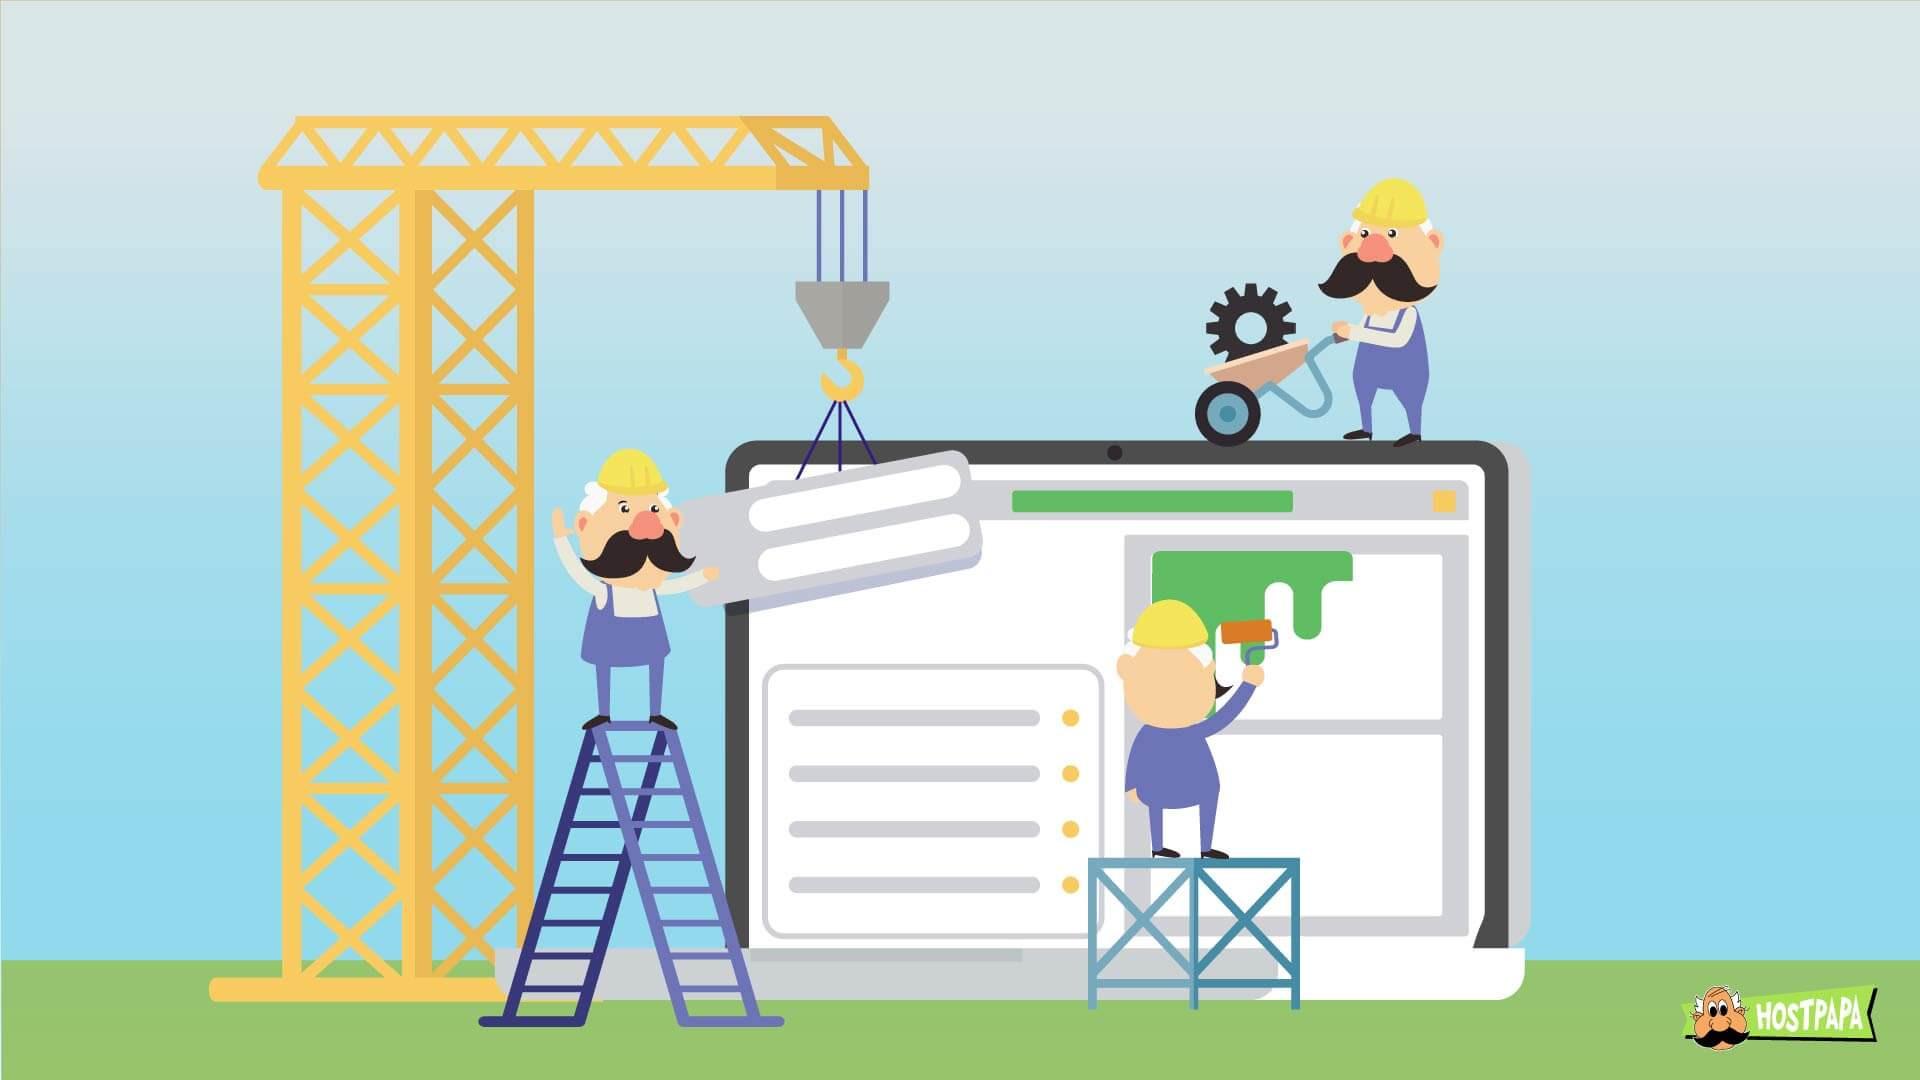 Diy Websitebuilder  Website Builder All the Tools You Need for a DIY Website